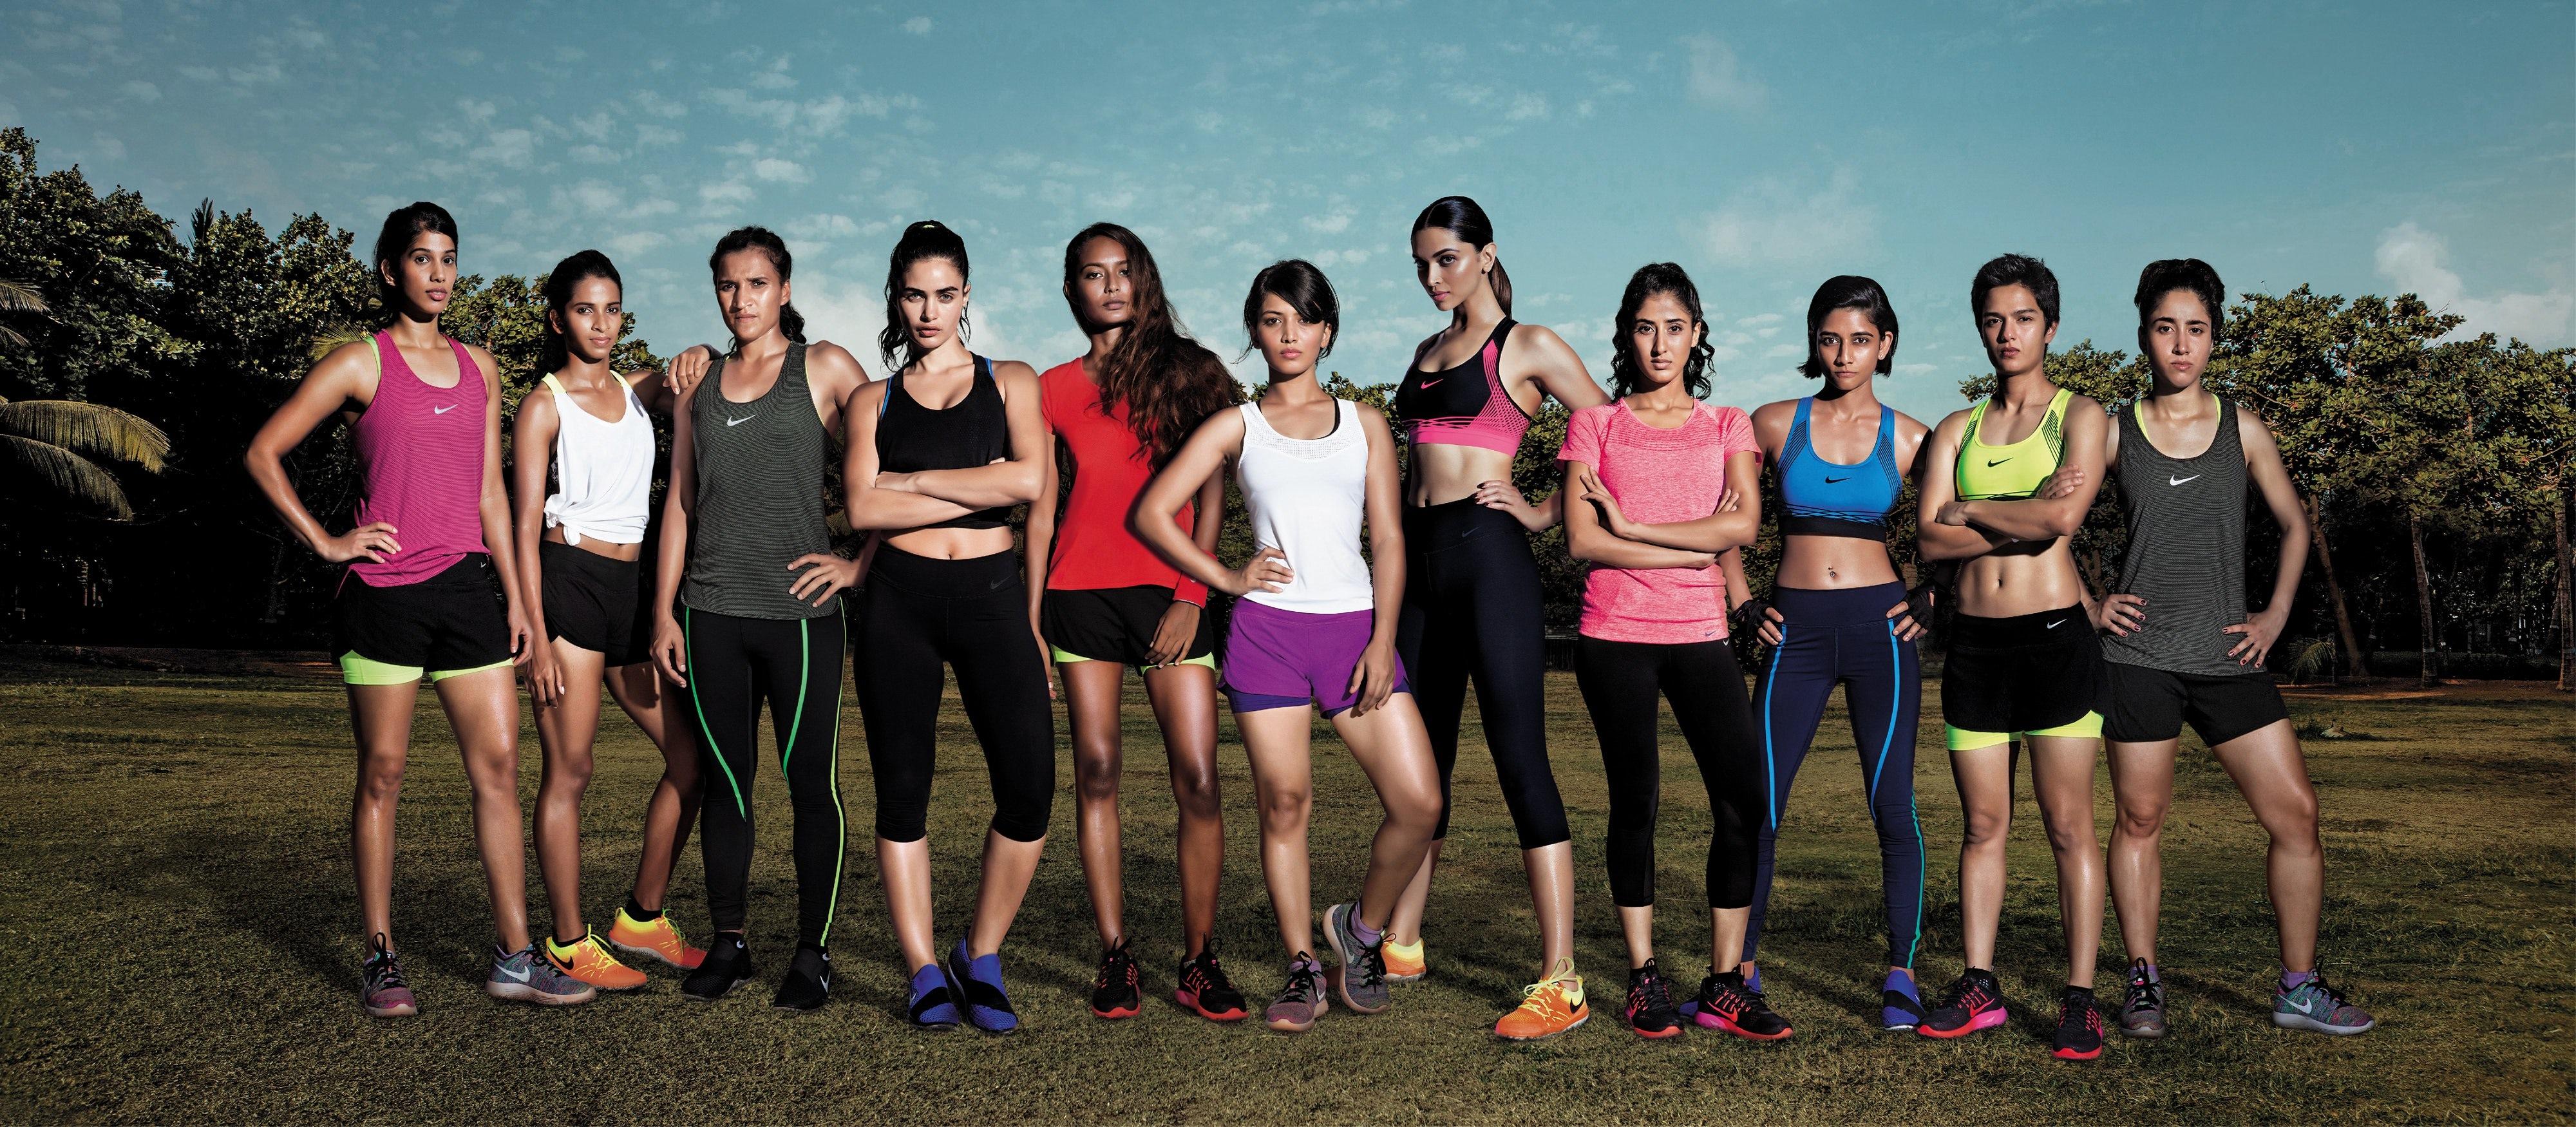 Nike India Da Da Ding campaign   Source: Courtesy